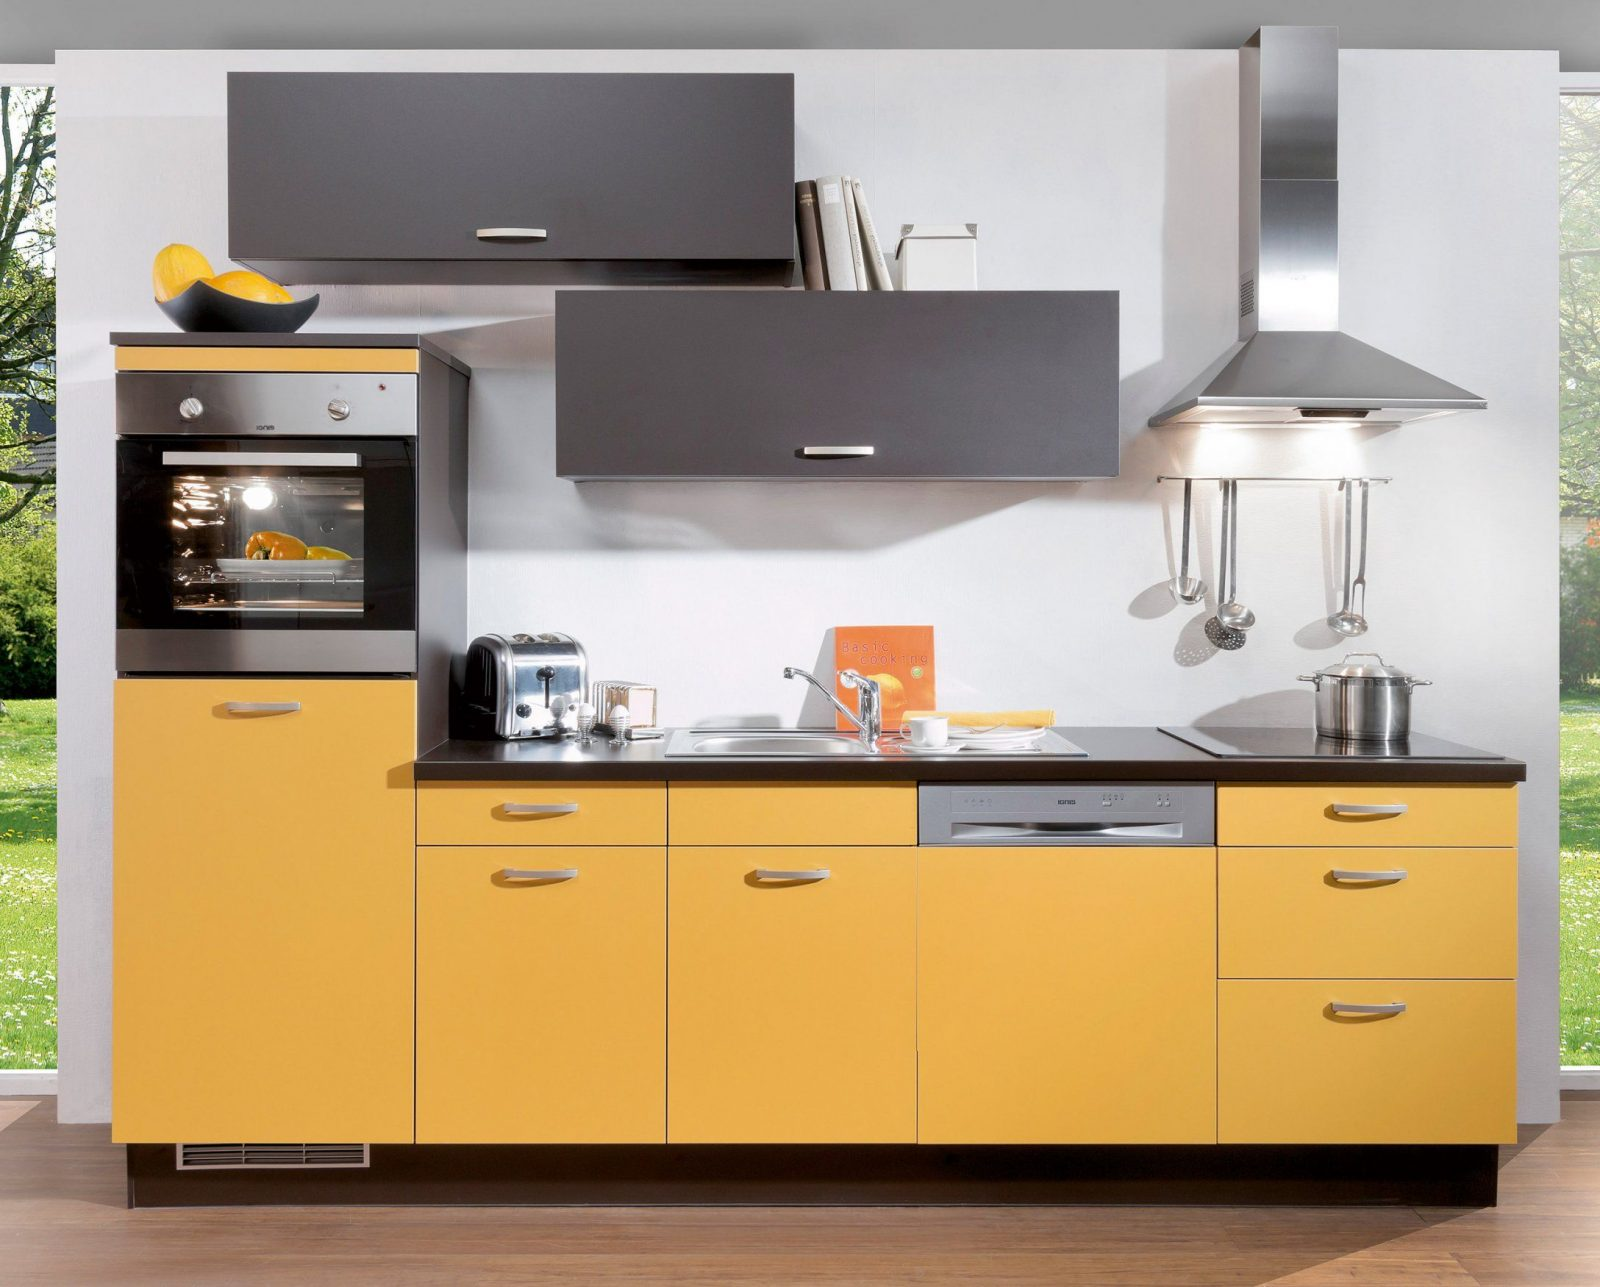 Günstige Einbauküchen Mit Elektrogeräten Gunstige Einbaukuchen von Einbauküchen Mit Elektrogeräten Ikea Photo